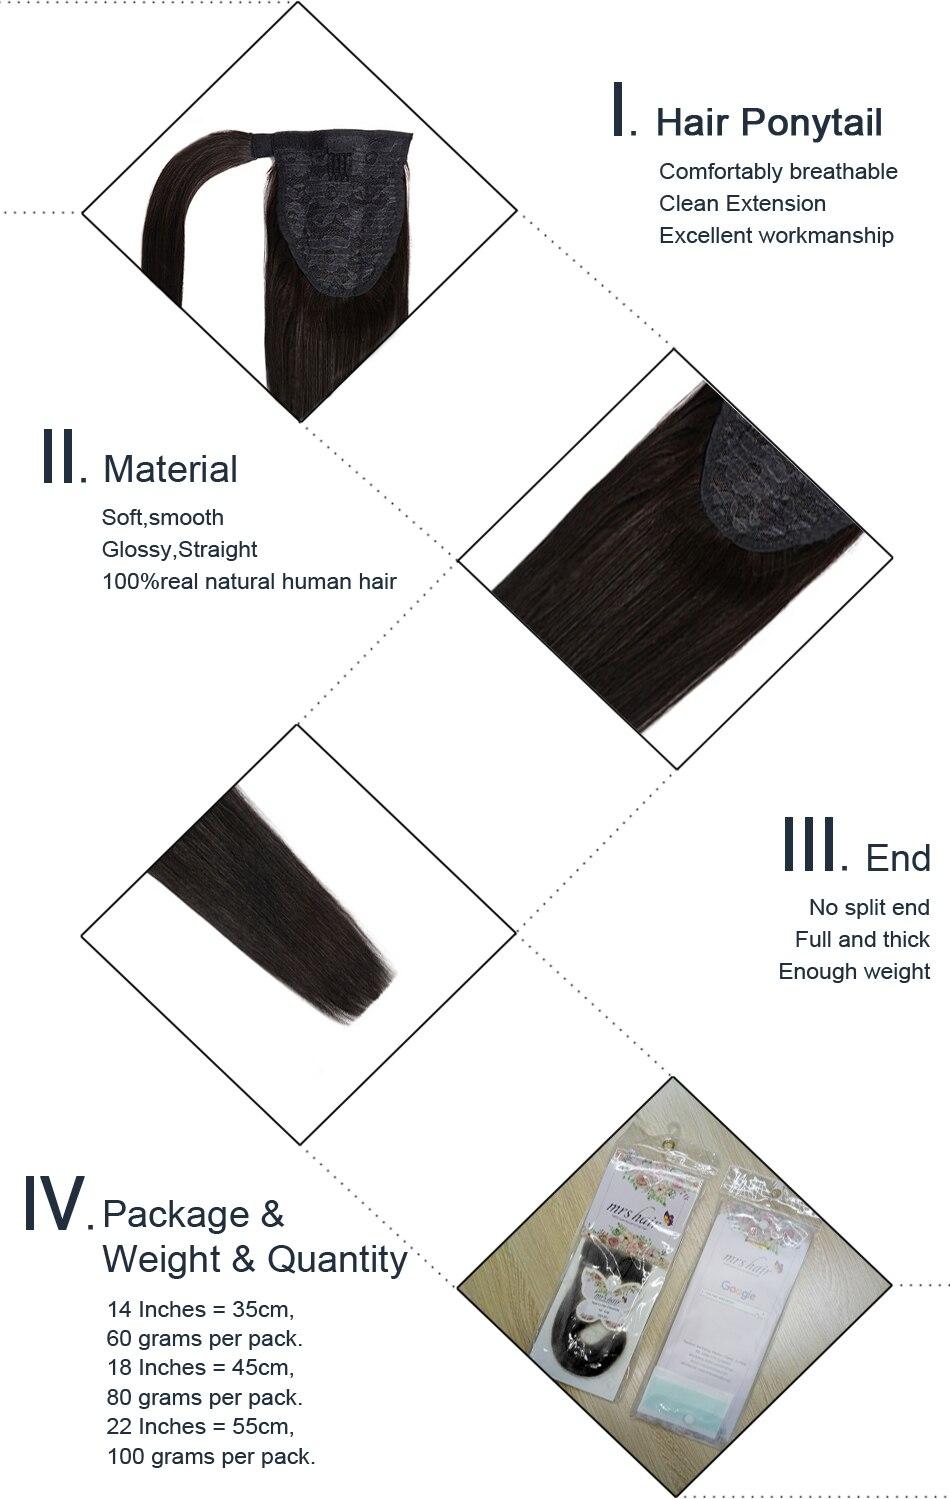 6product details